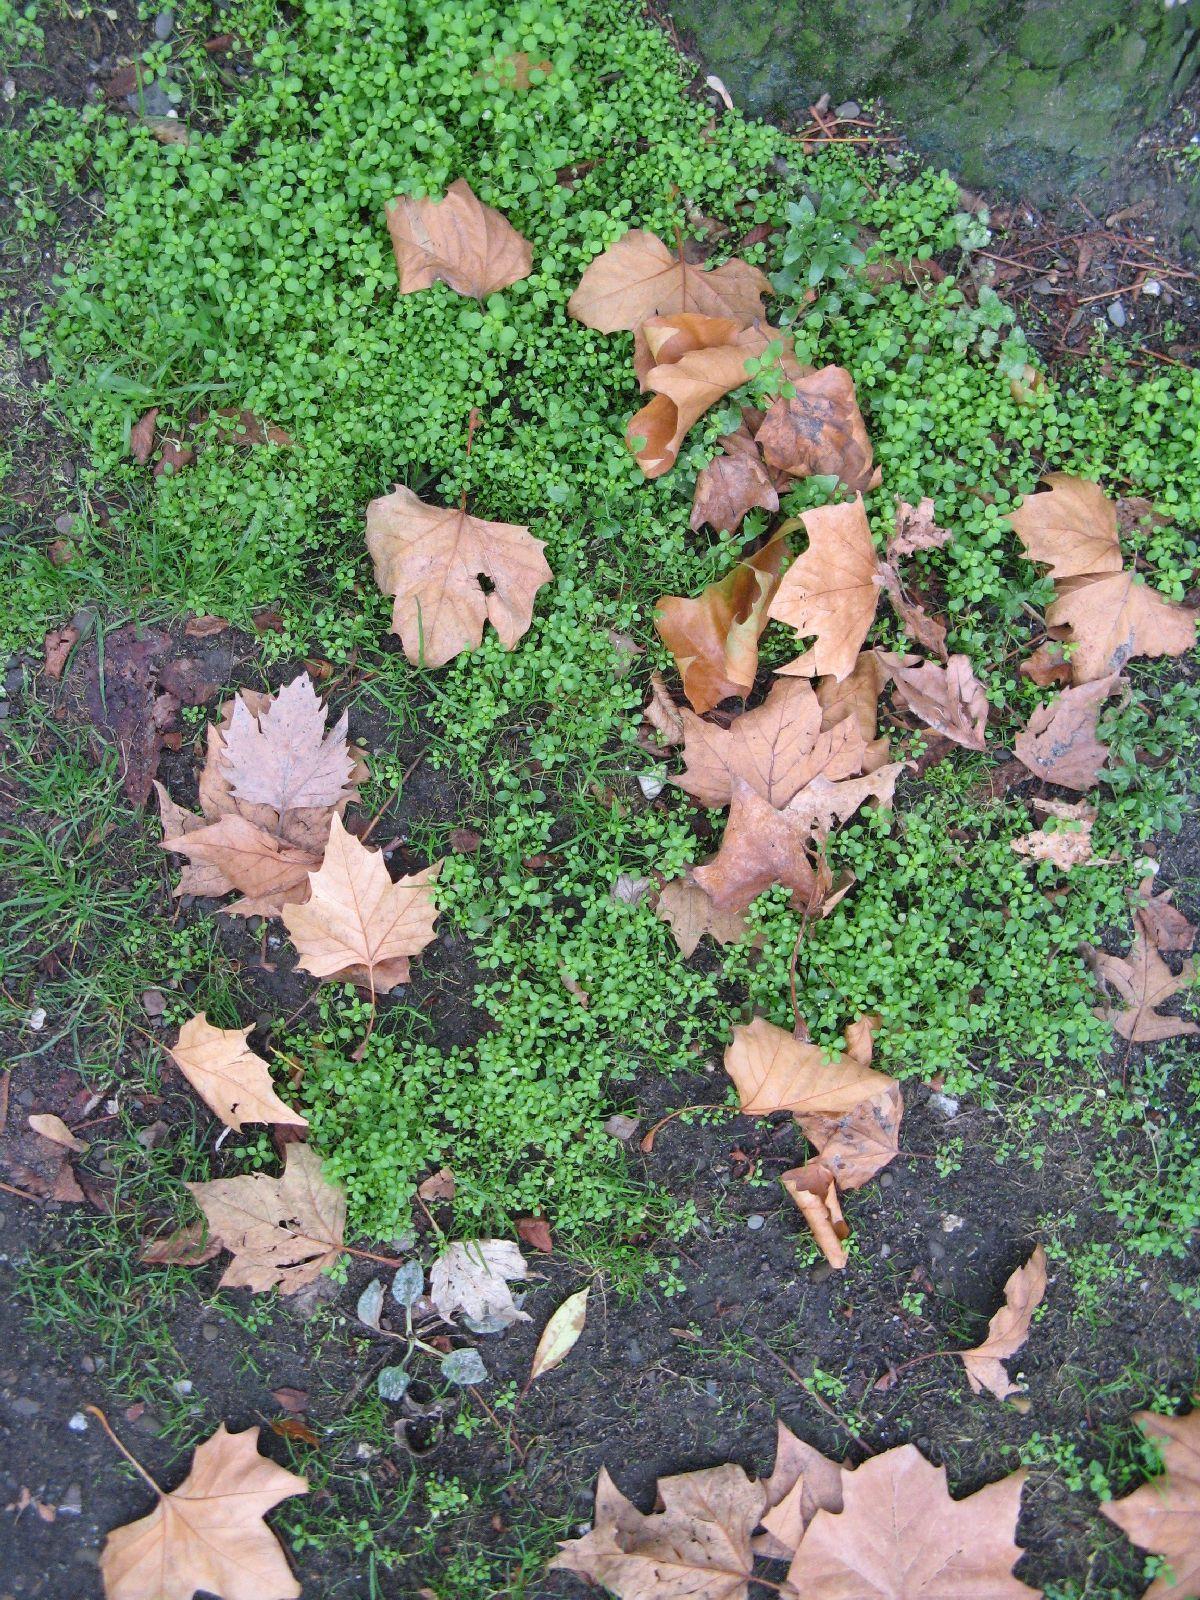 Boden-Gras-Moos-Blumen_Textur_B_09200